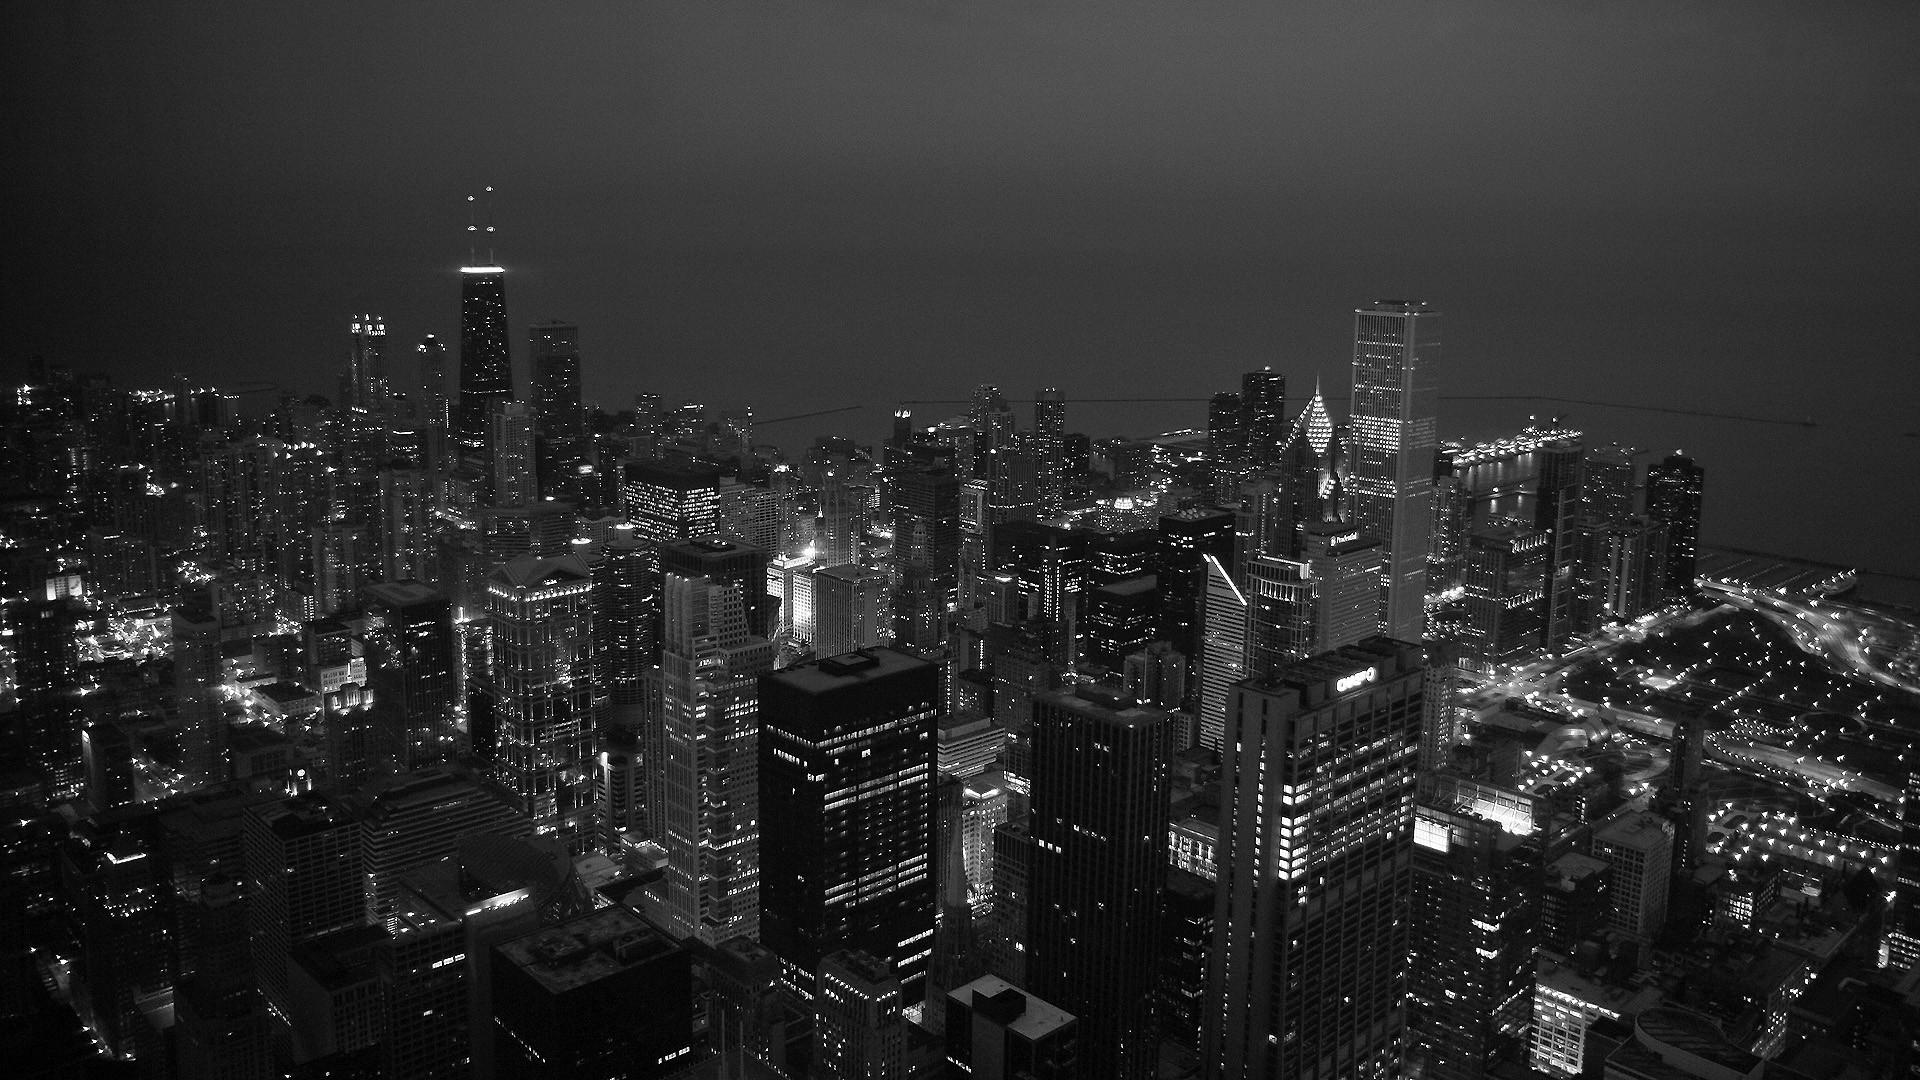 Обои kuala lumpur tower, дома, небоскребы, Чёрно-белое фото. Города foto 12